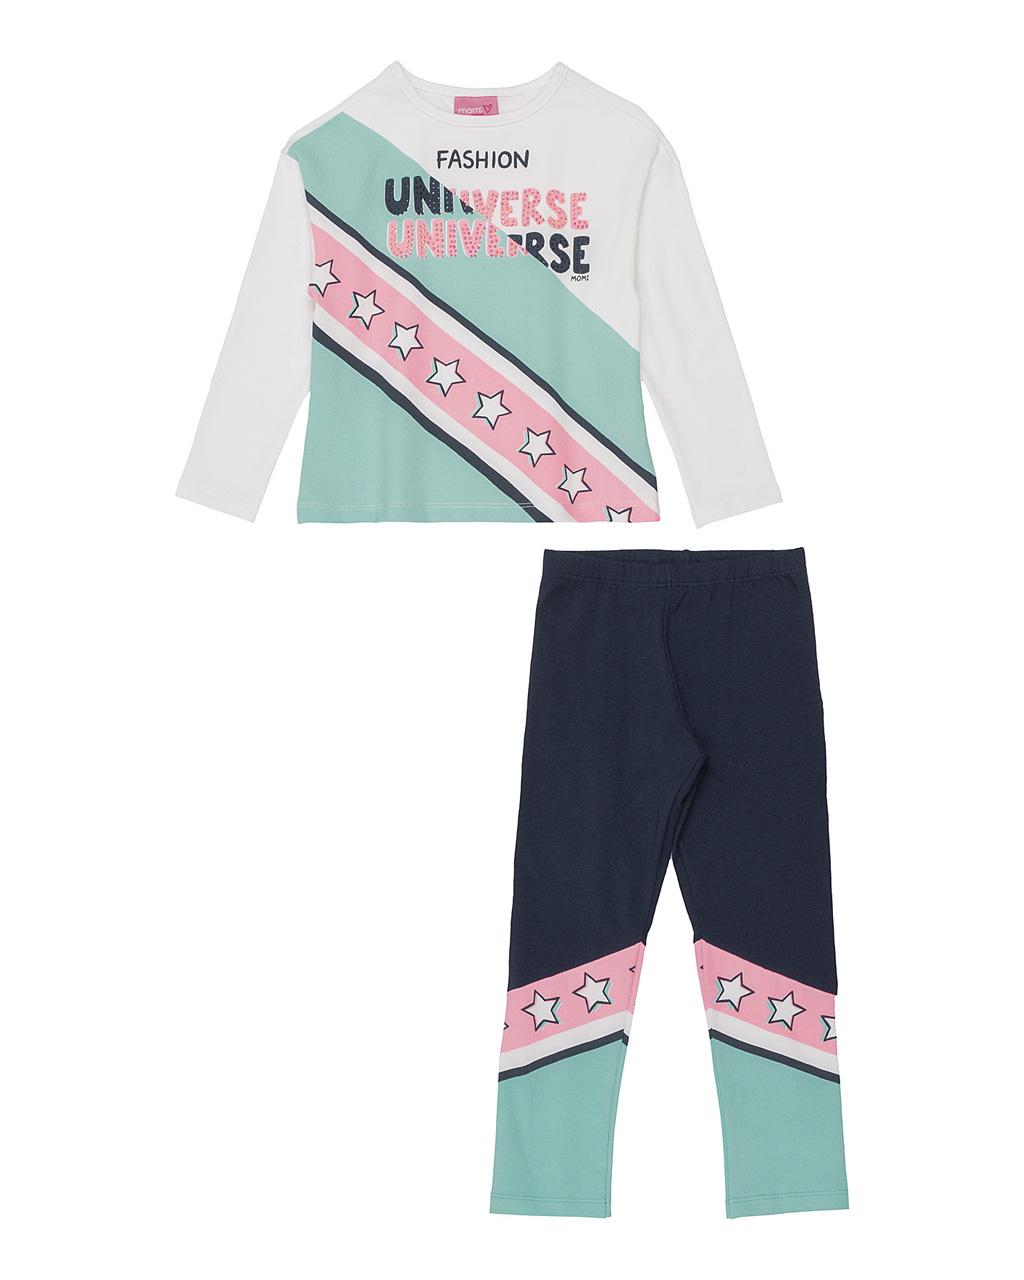 Conjunto Infantil Blusa Manga Longa e Legging Fashion Universe Off White Momi